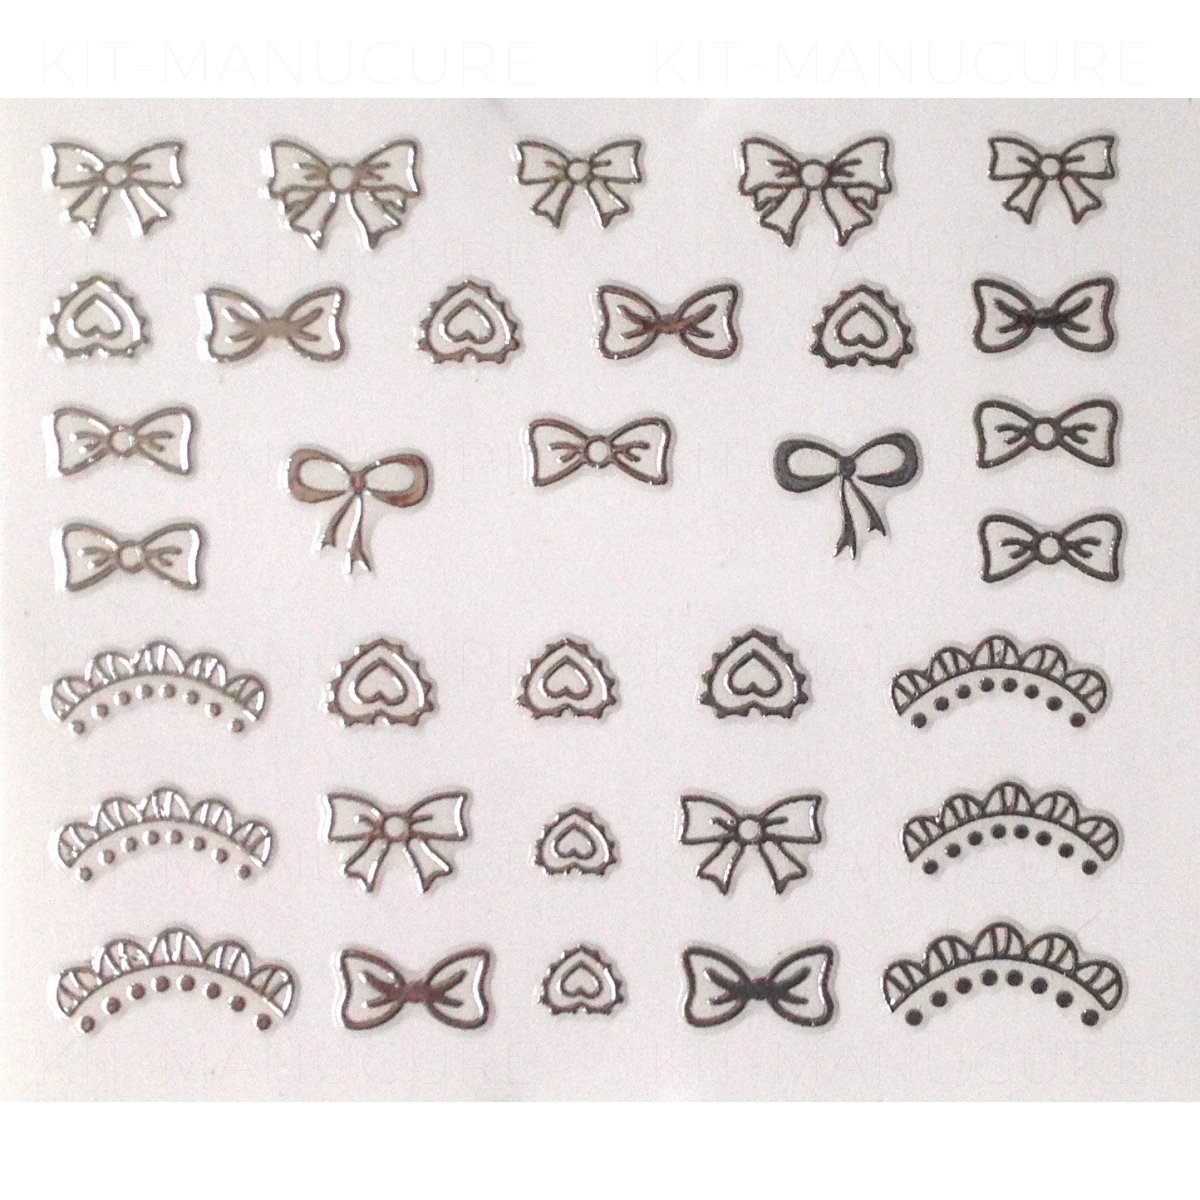 https://www.kit-manucure.com/577-thickbox_default/stickers-pour-ongle-noeuds-assortis-argenté.jpg